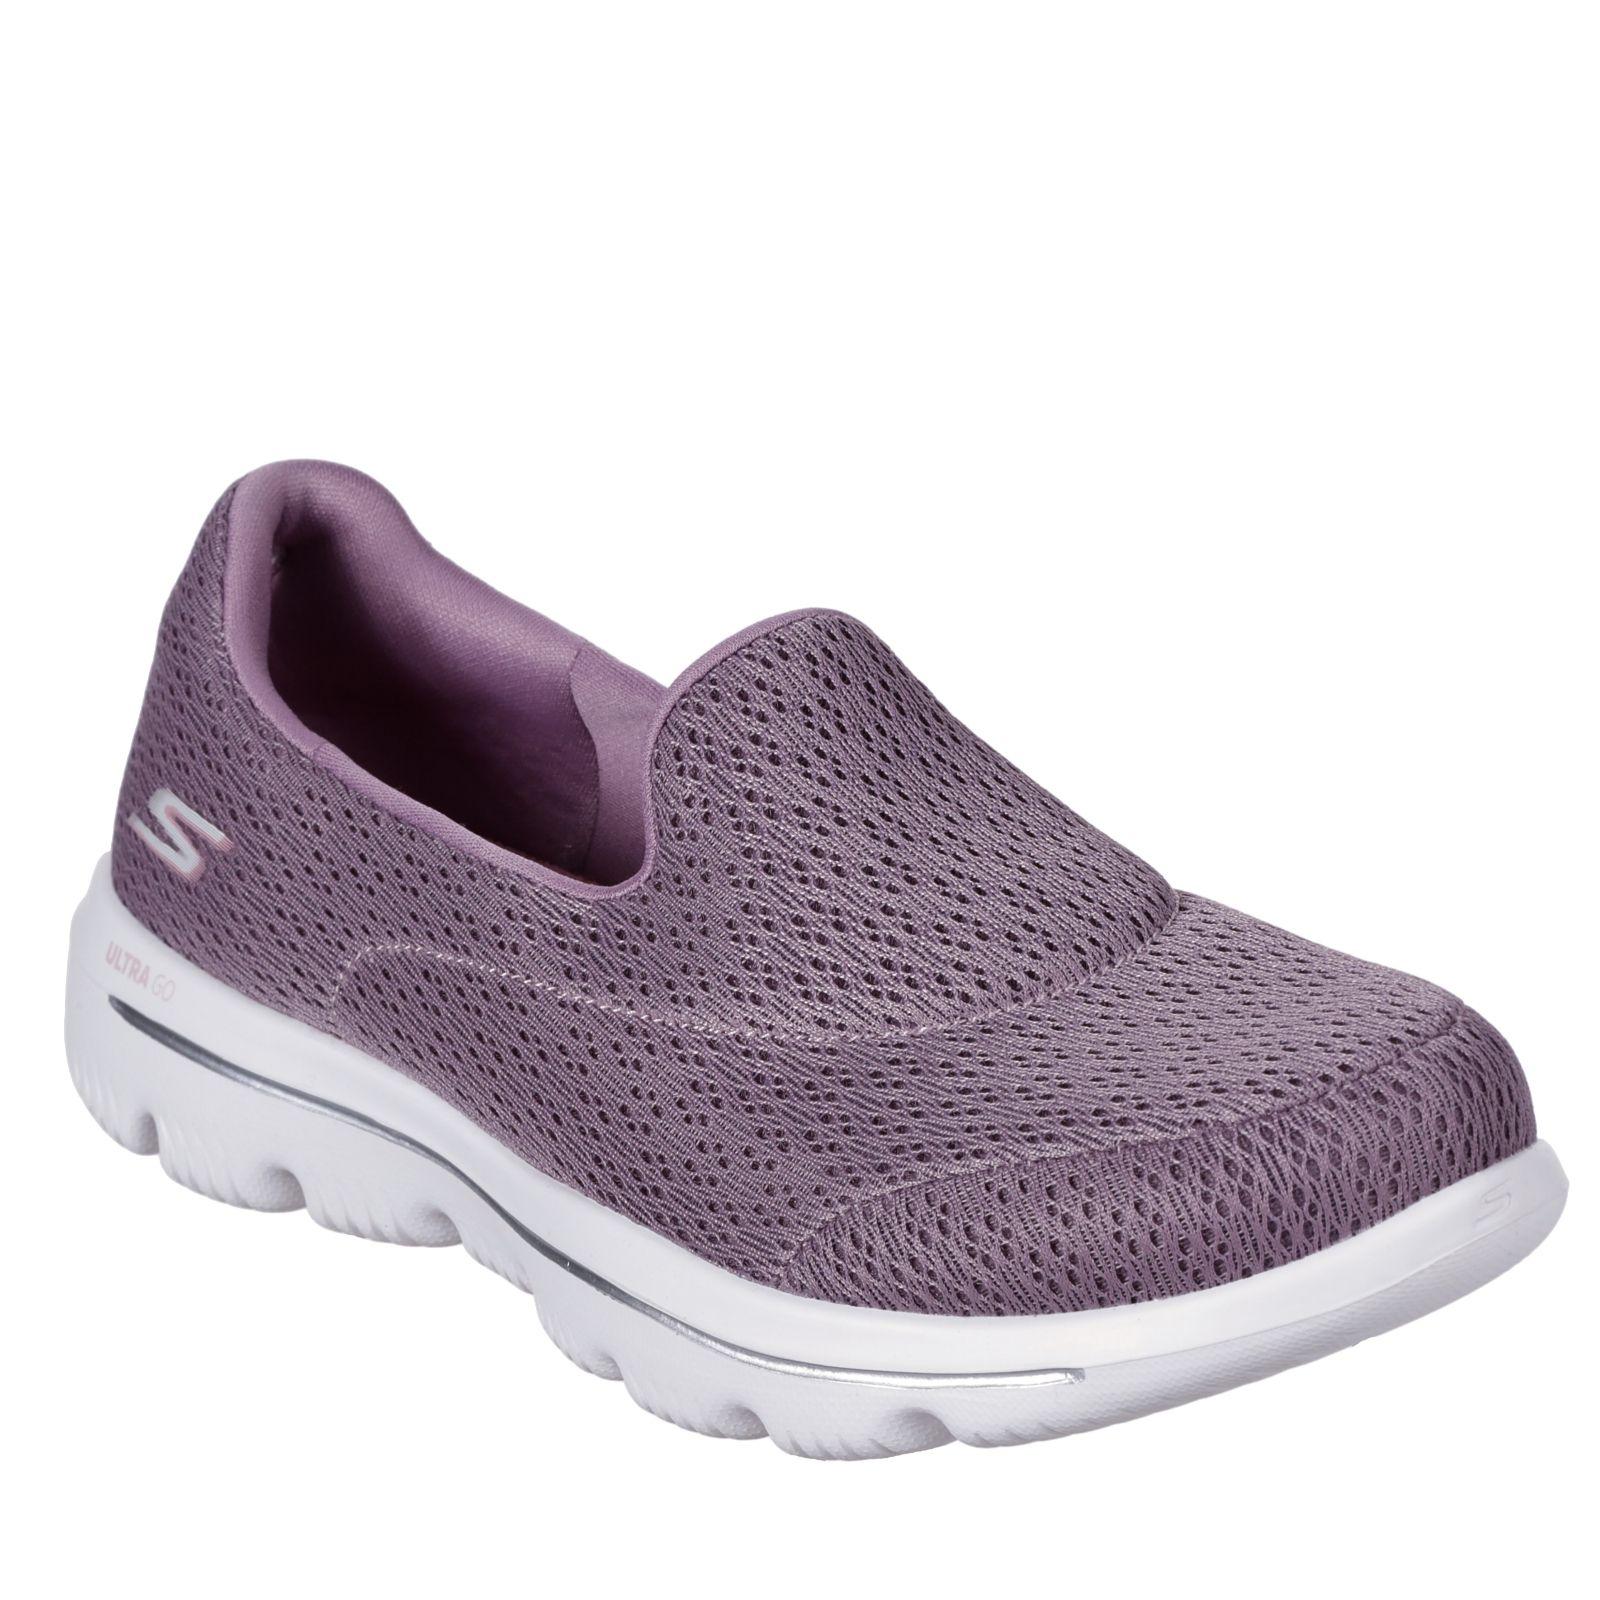 Treffen großhandel online Keine Verkaufssteuer Skechers Go Walk Crochet Slip On Trainer - QVC UK